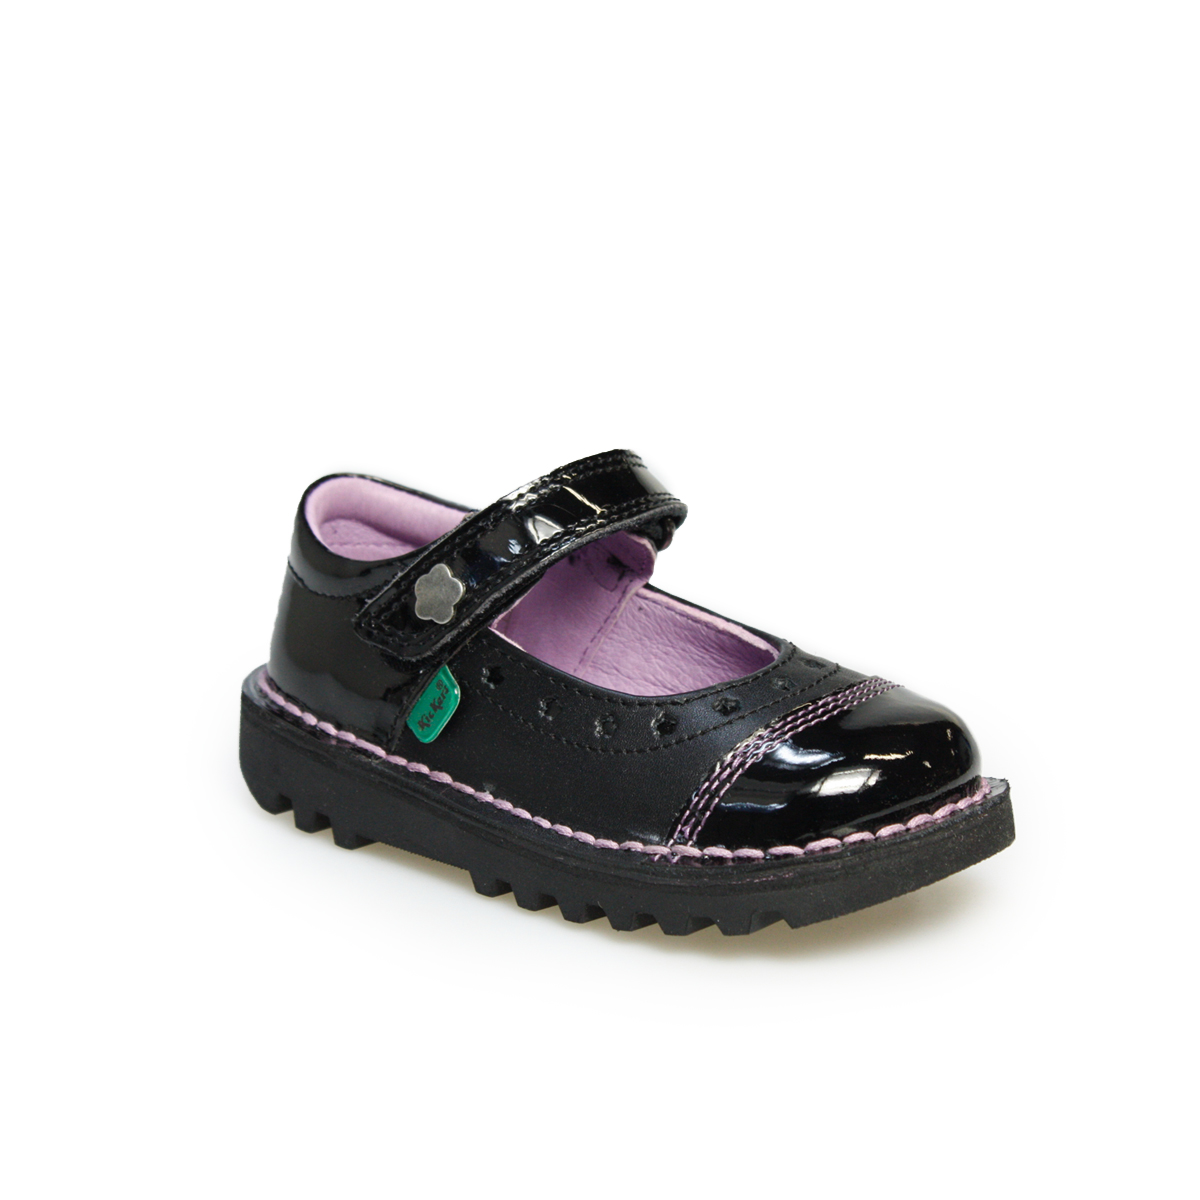 Black kicker sandals - Kickers Mary Jane Fairy Black Leather Infants Girls Kids Buckle Shoes Size 7 8 5